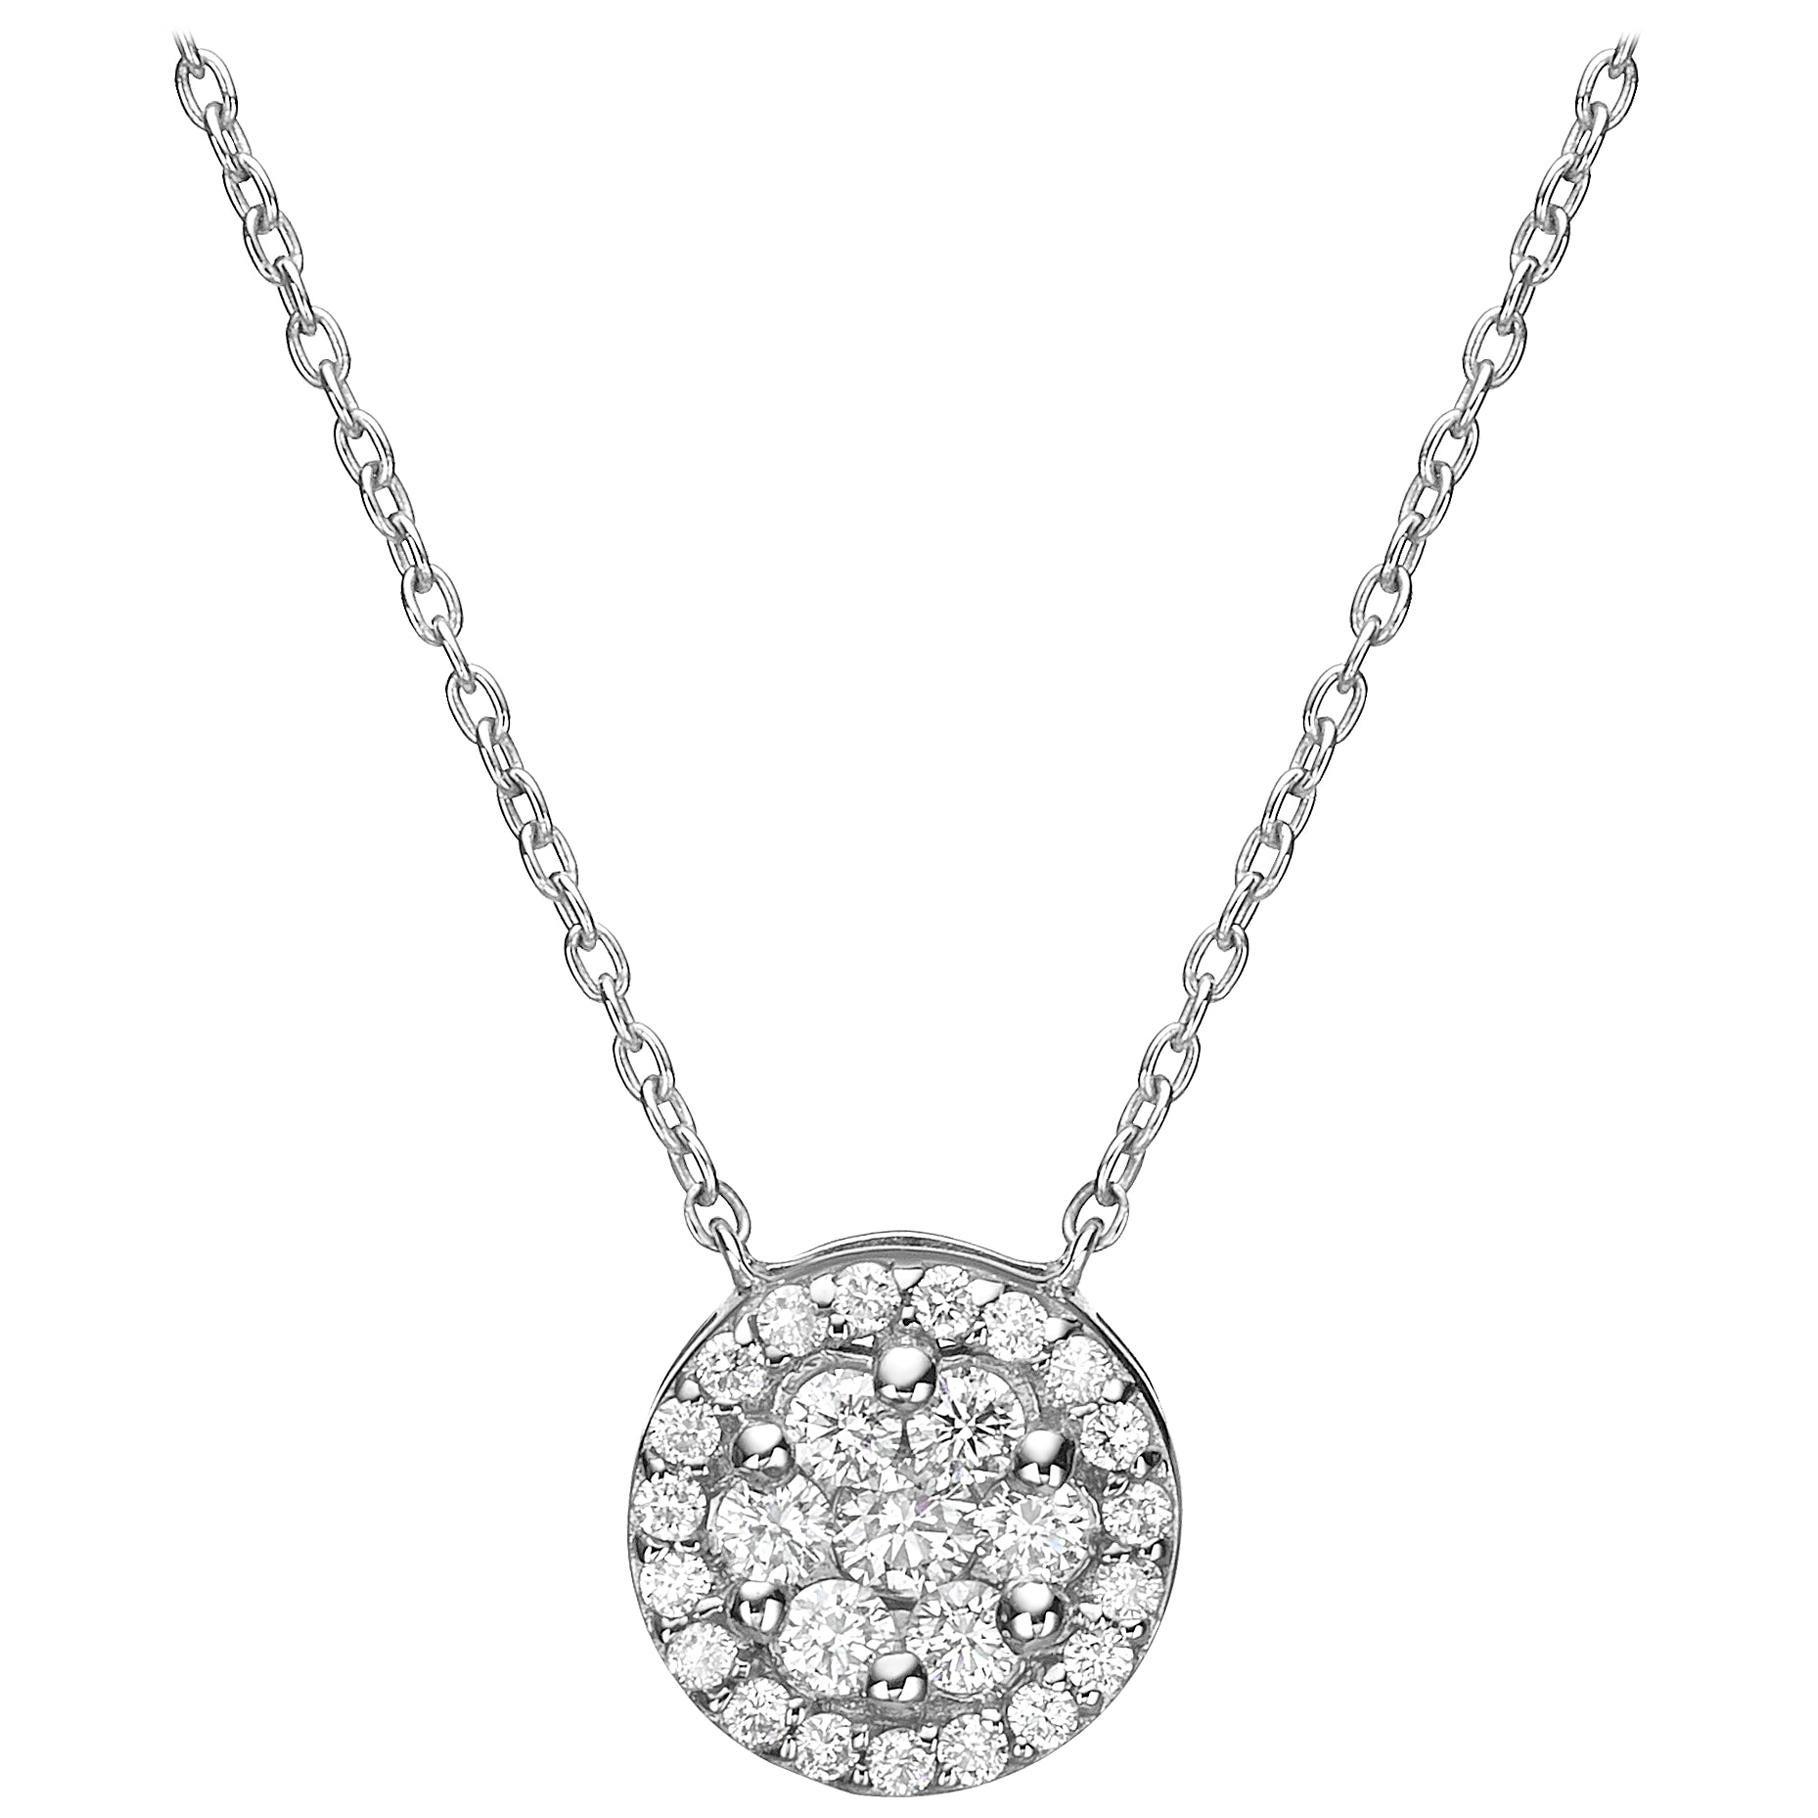 18 Karat Gold, 0.40 Carat, F Color, VS Clarity, Diamond Crusted Flower Pendant